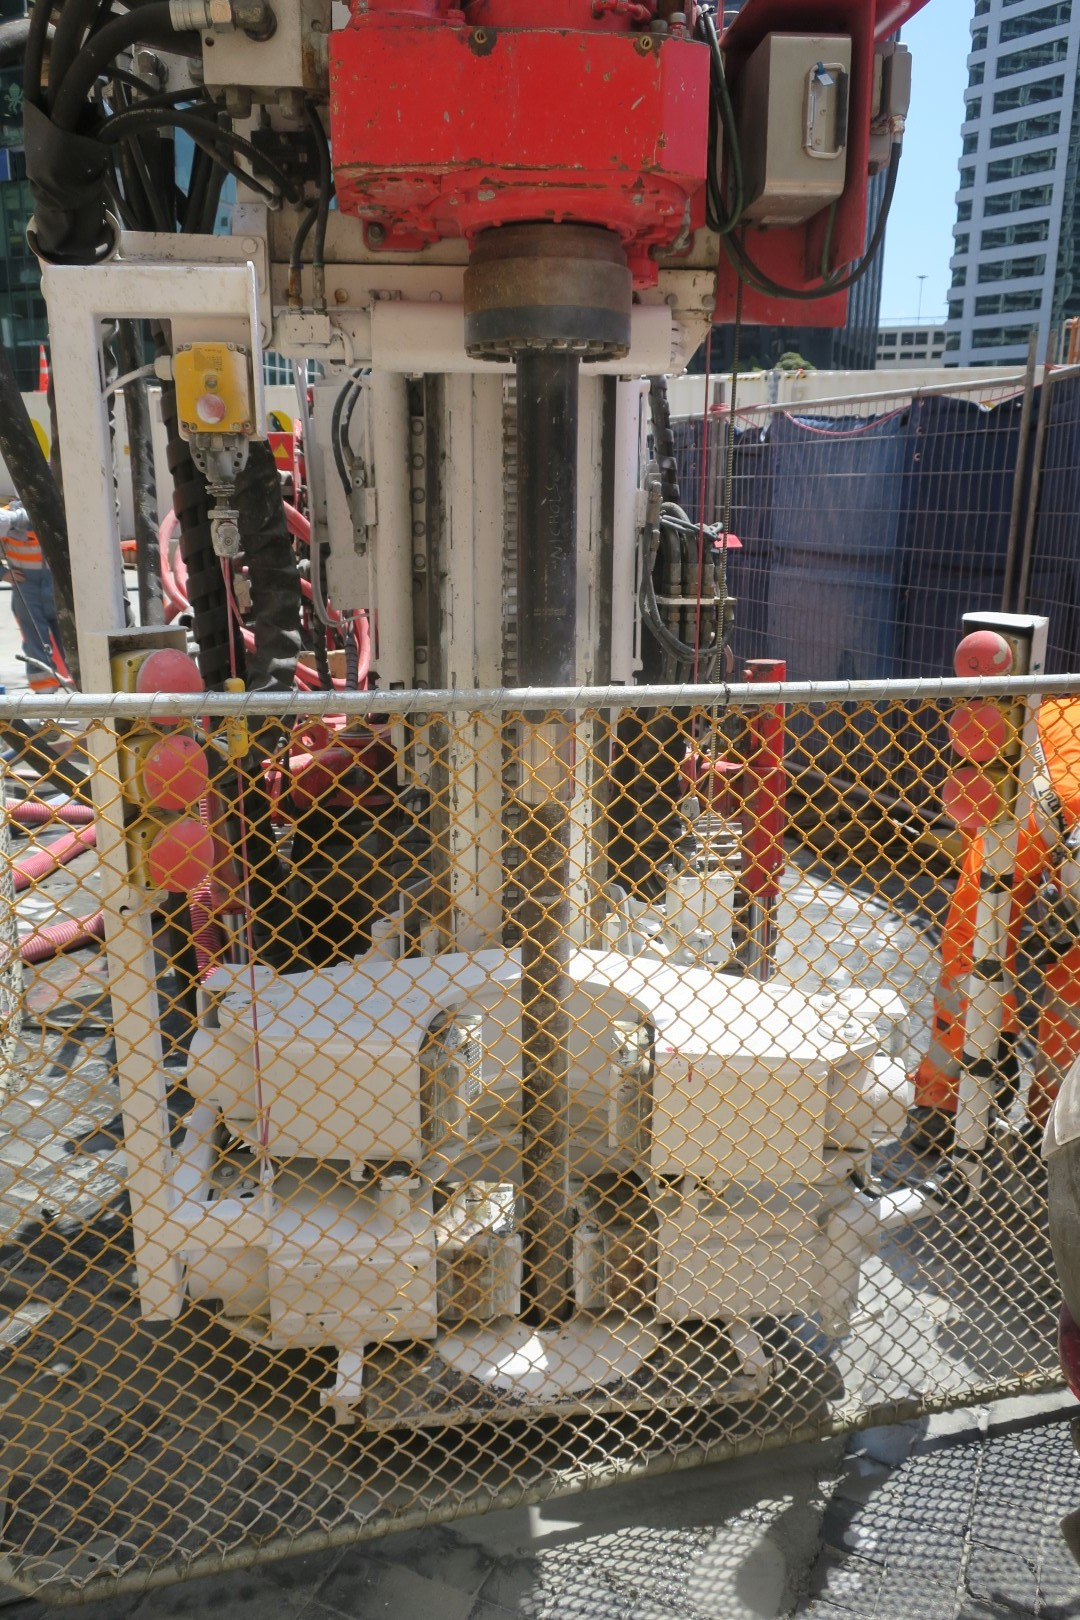 CRL construction work in Lower Queen Street.